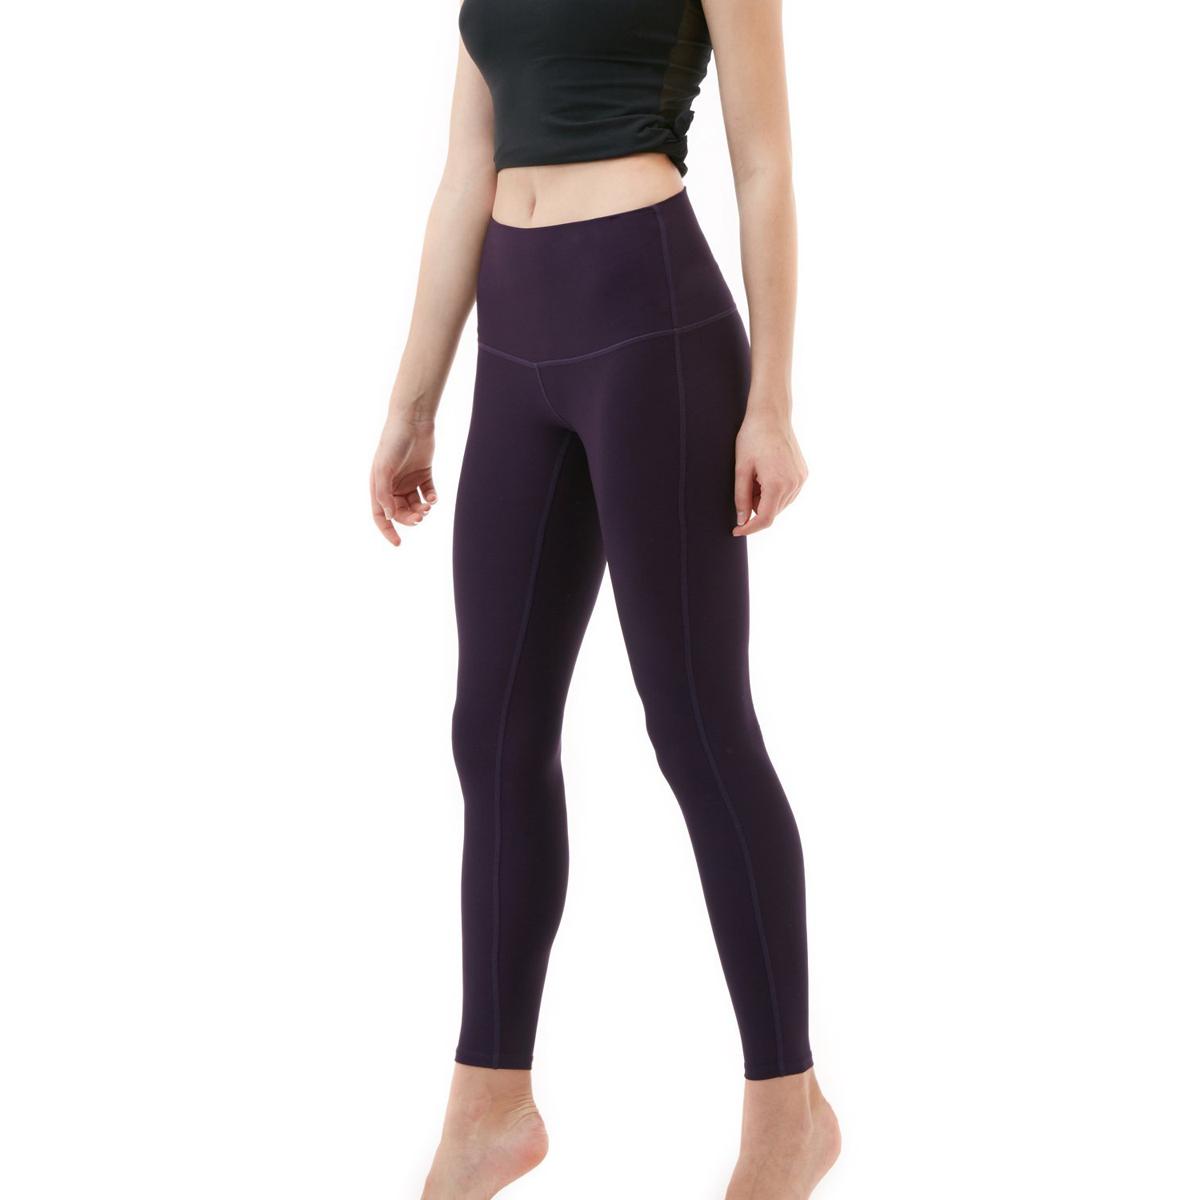 thumbnail 31 - TSLA Tesla FYP42 Women's High-Waisted Ultra-Stretch Tummy Control Yoga Pants